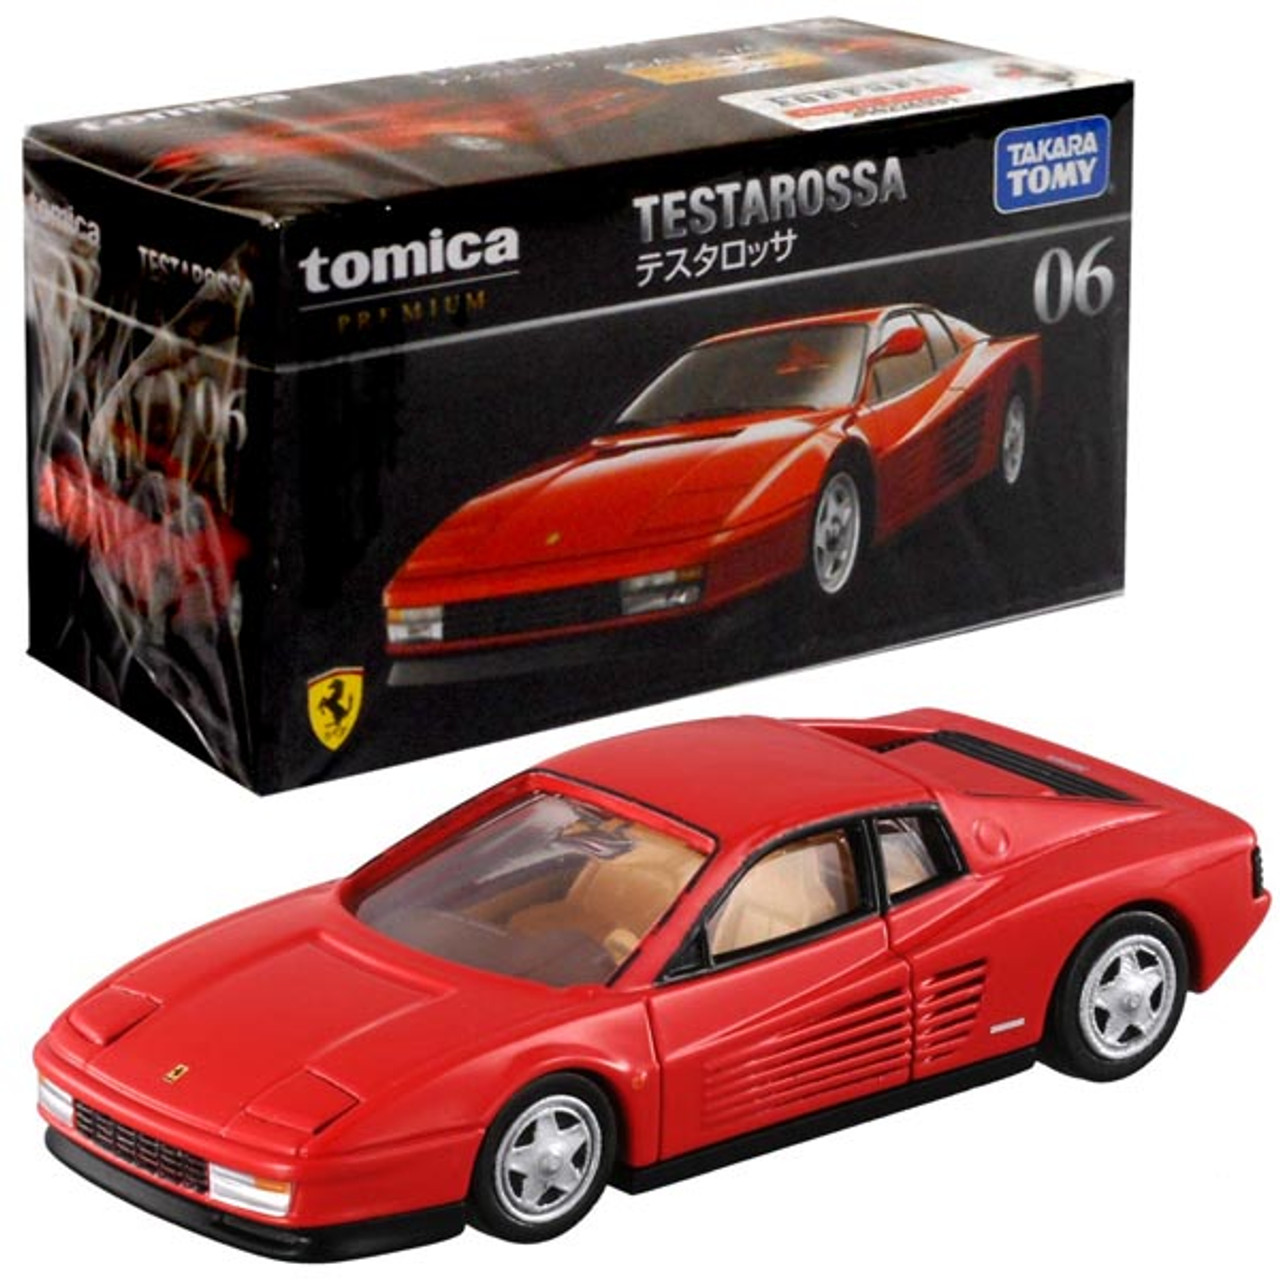 TAKARA TOMY TOMICA PREMIUM DieCast car 1:61 Ferrari TESTAROSSA #06